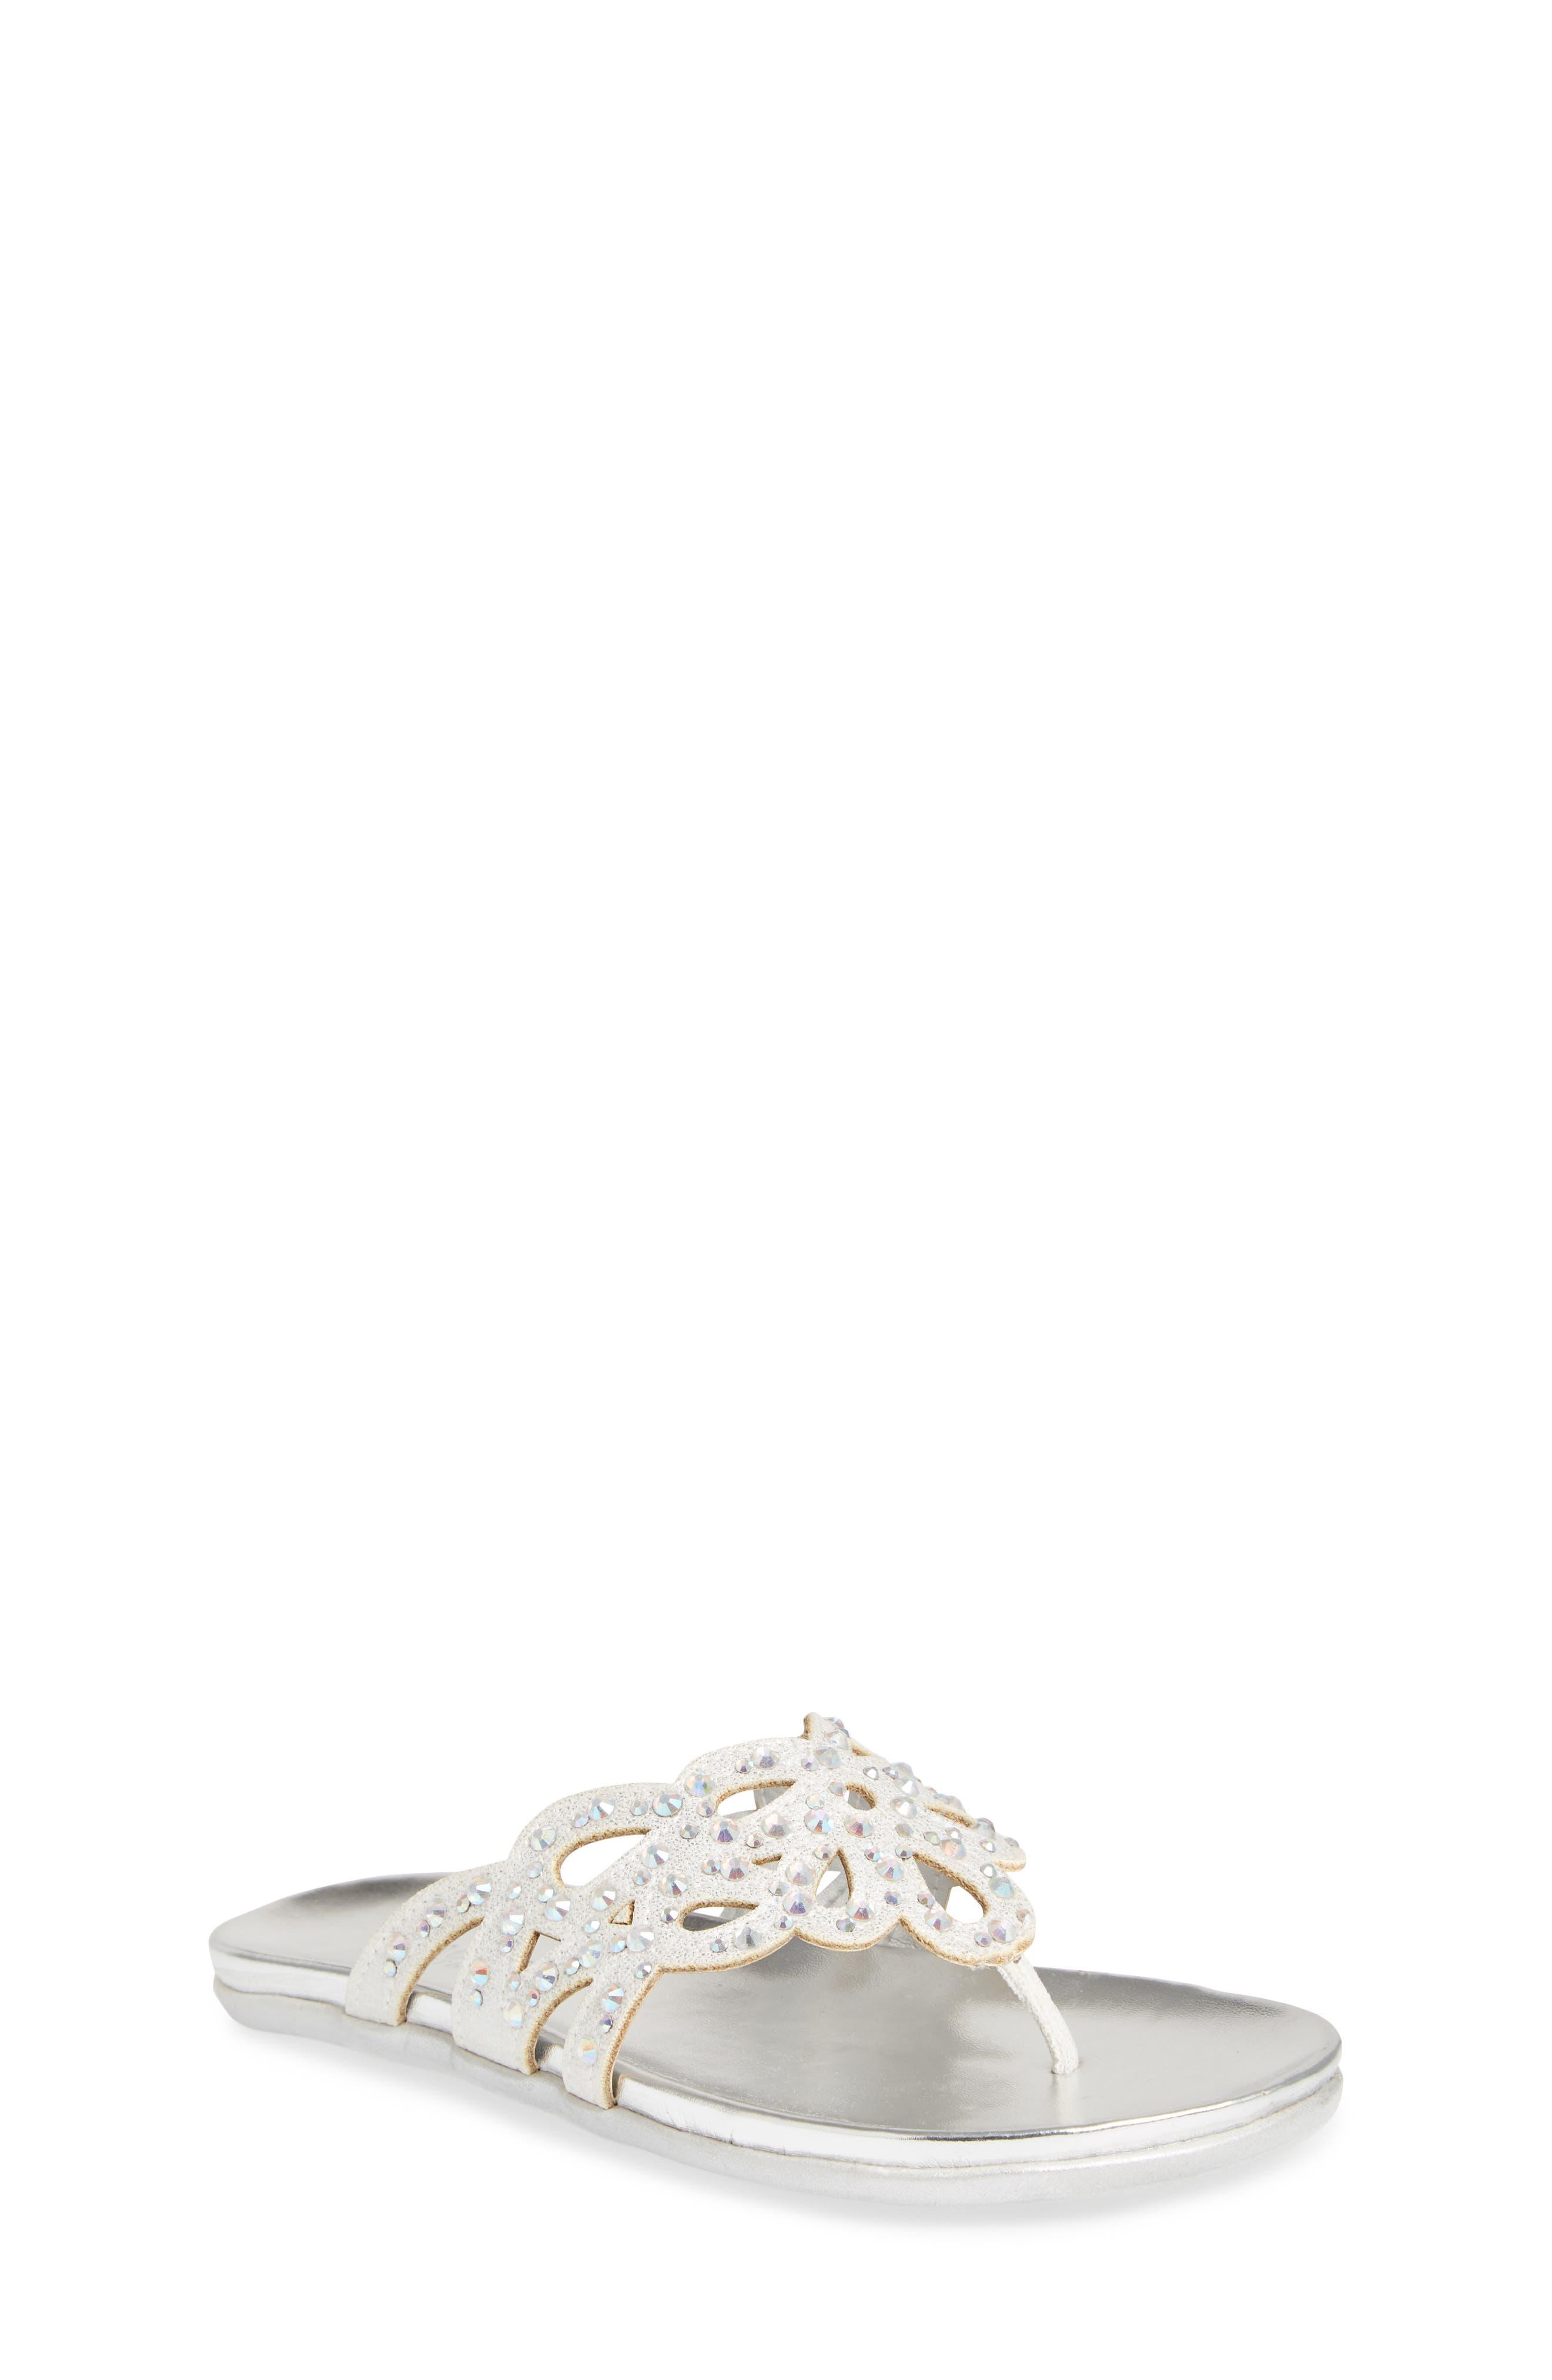 Kenneth Cole New York Flutter Metallic Crystal Thong Sandal,                         Main,                         color, 044